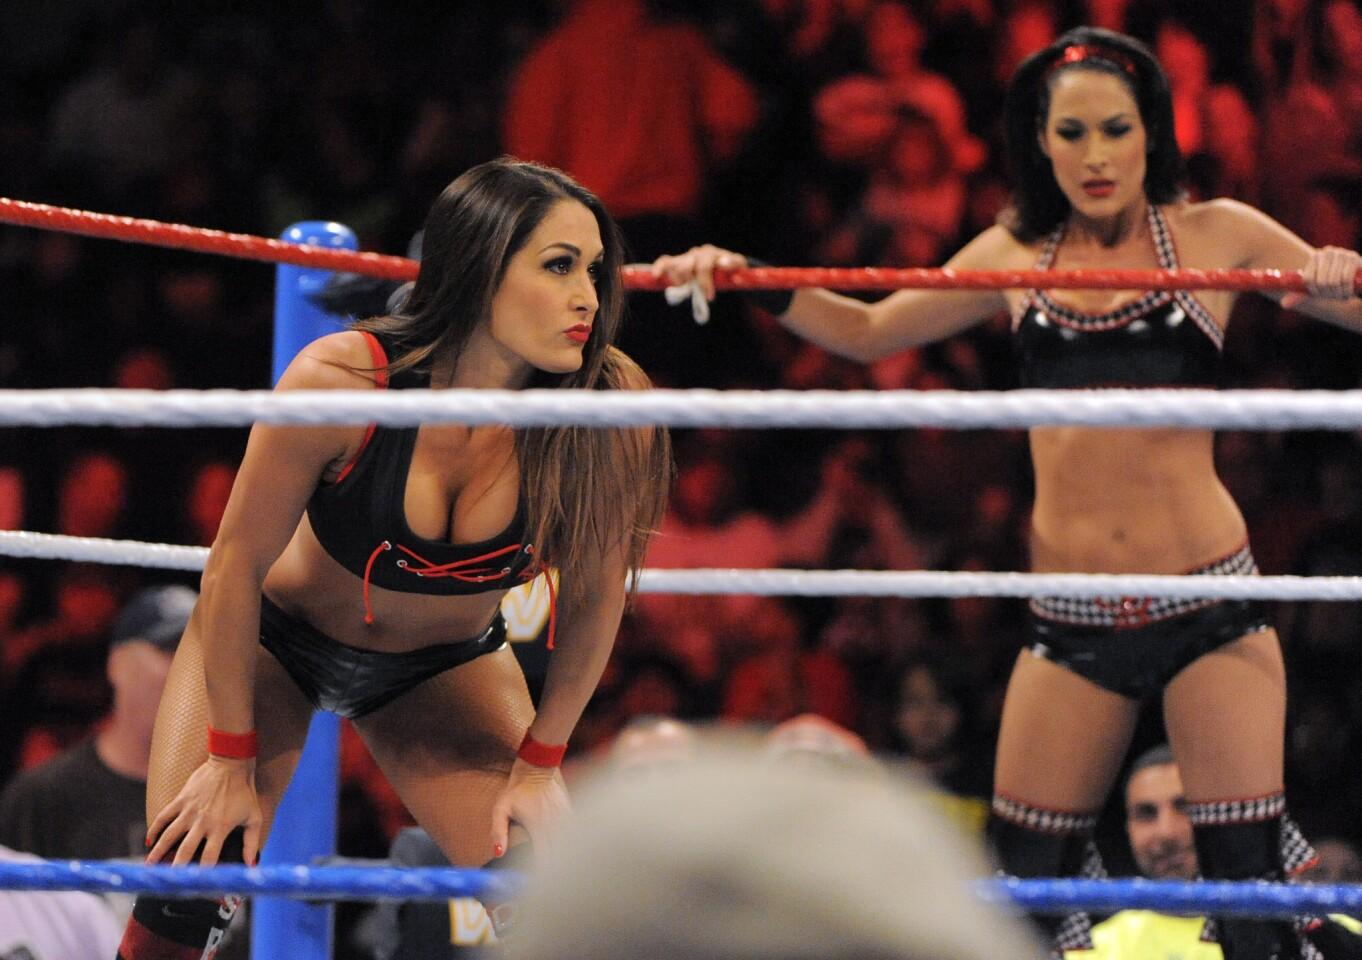 Brie Bella and Nikki Bella compete in a Divas tag-team match at Baltimore Arena.